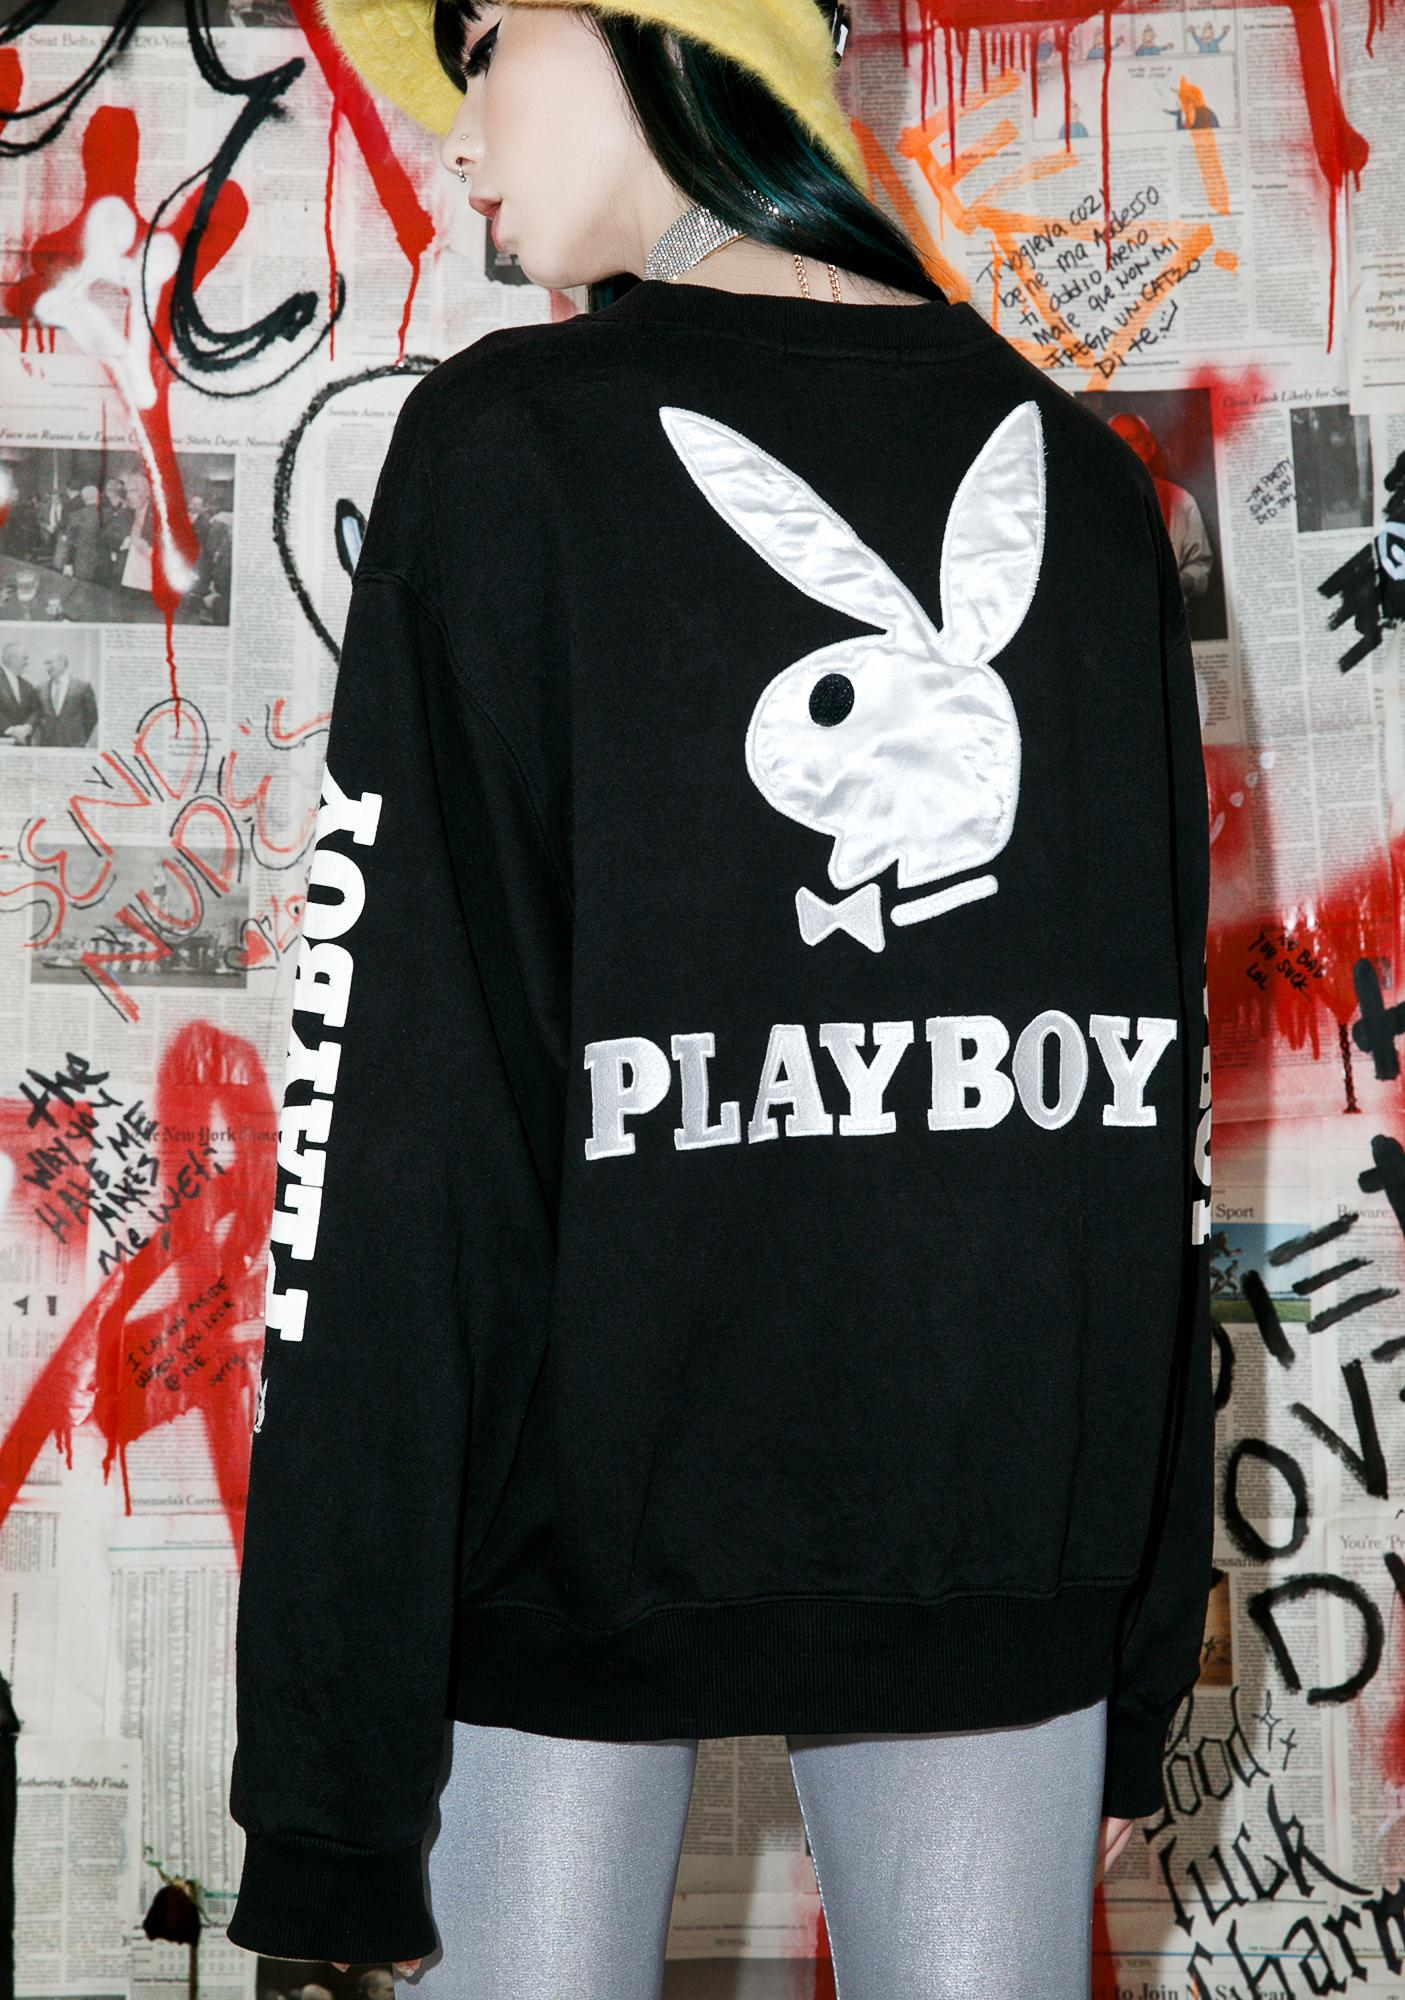 Vintage 90s Playboy Logo Sweatshirt